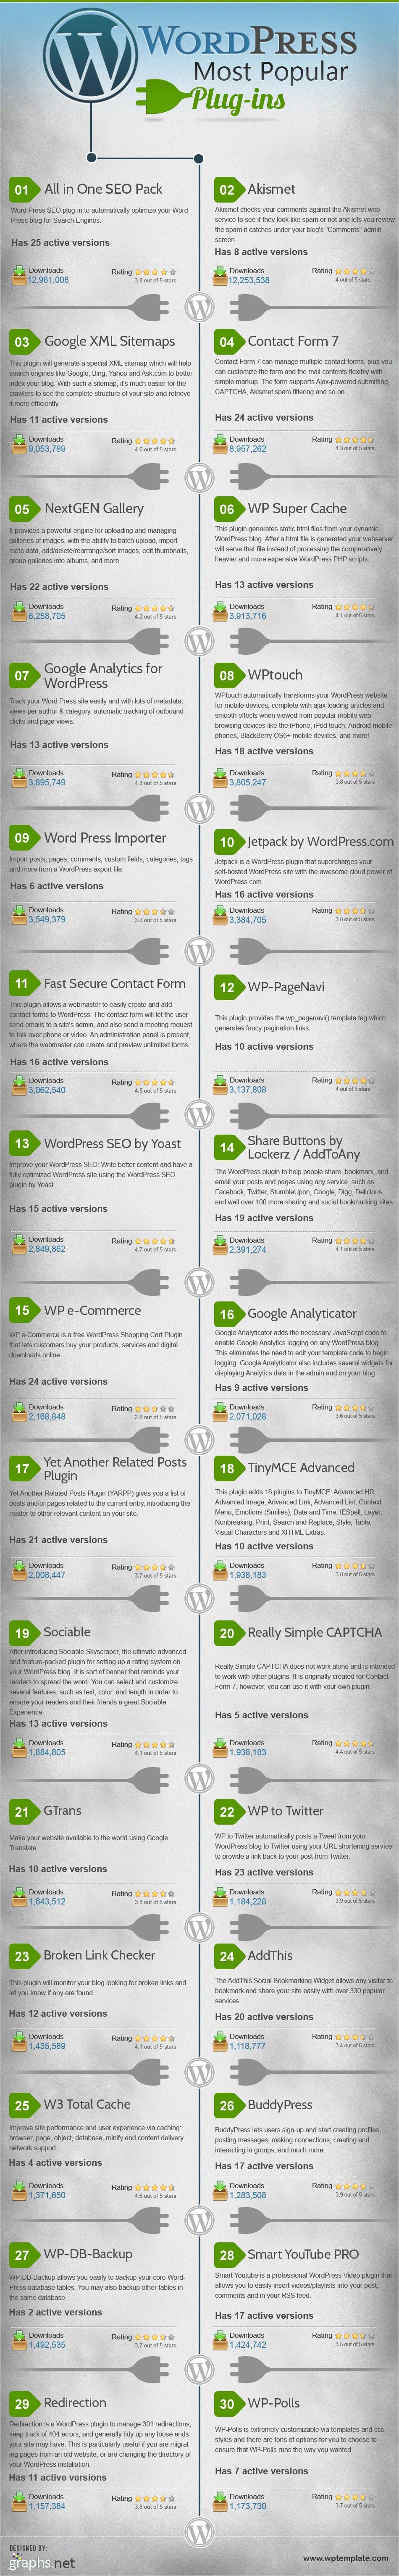 Wordpress Must Have Plugins-Infographic